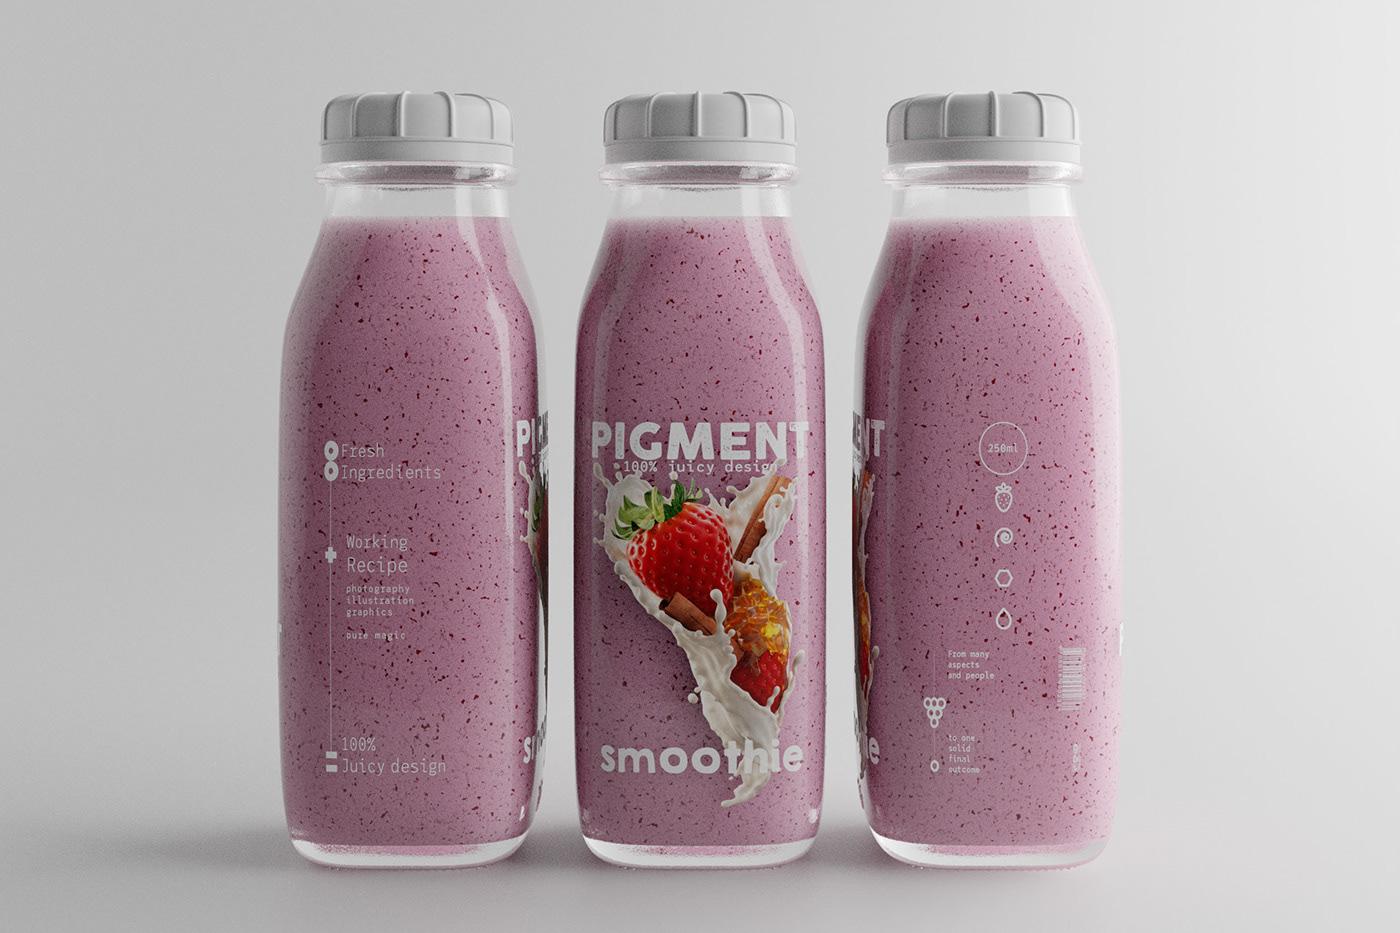 splash blueberry rasberry strawberry milk honey cinnamon product visualisation label design